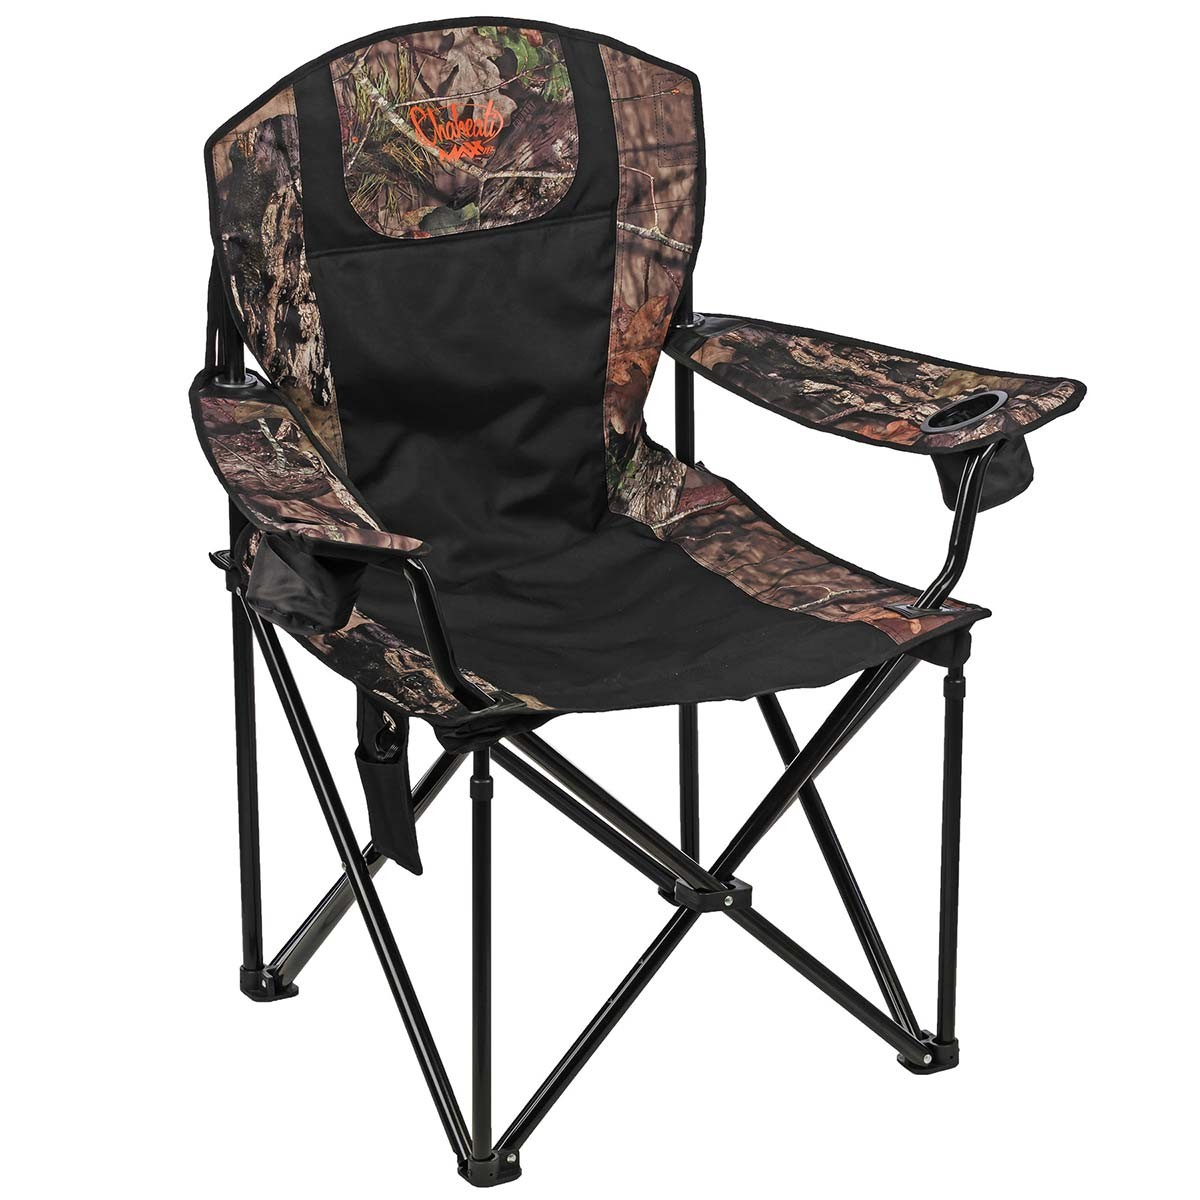 Chaheati Mossy Oak Maxx Heated Folding Chair